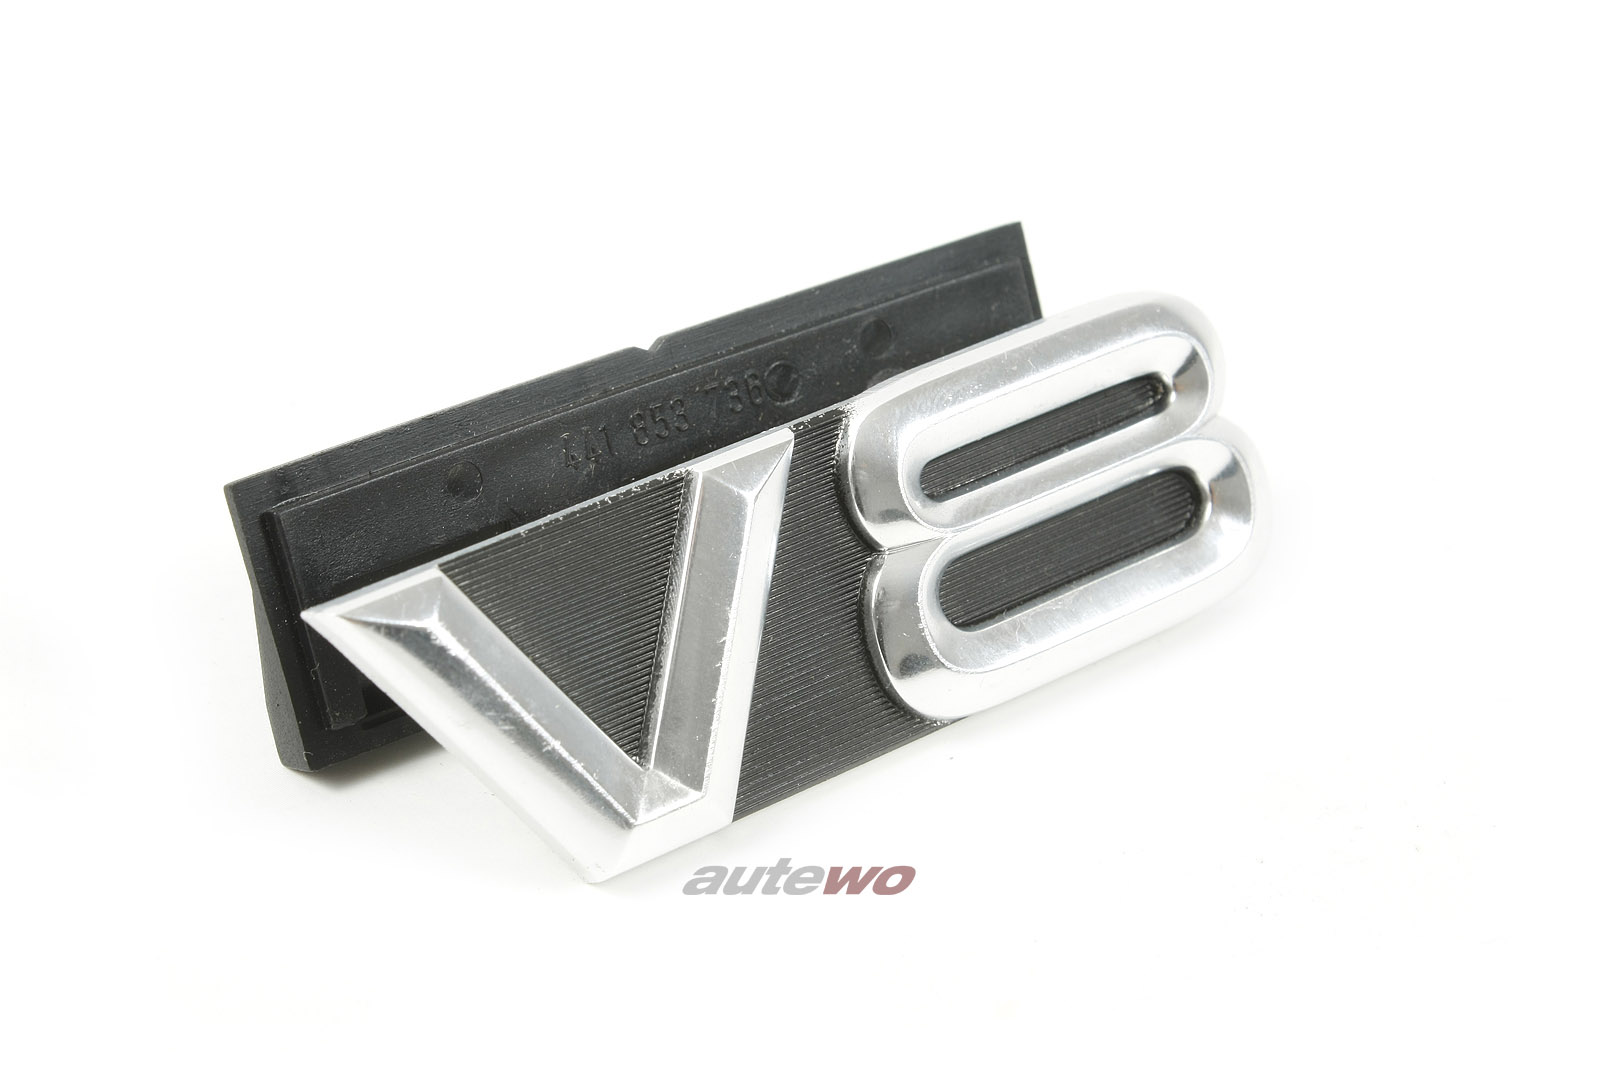 441853736 NEU Audi V8 D11 V8 Kühlergrill Emblem + Befestigungsmaterial silber